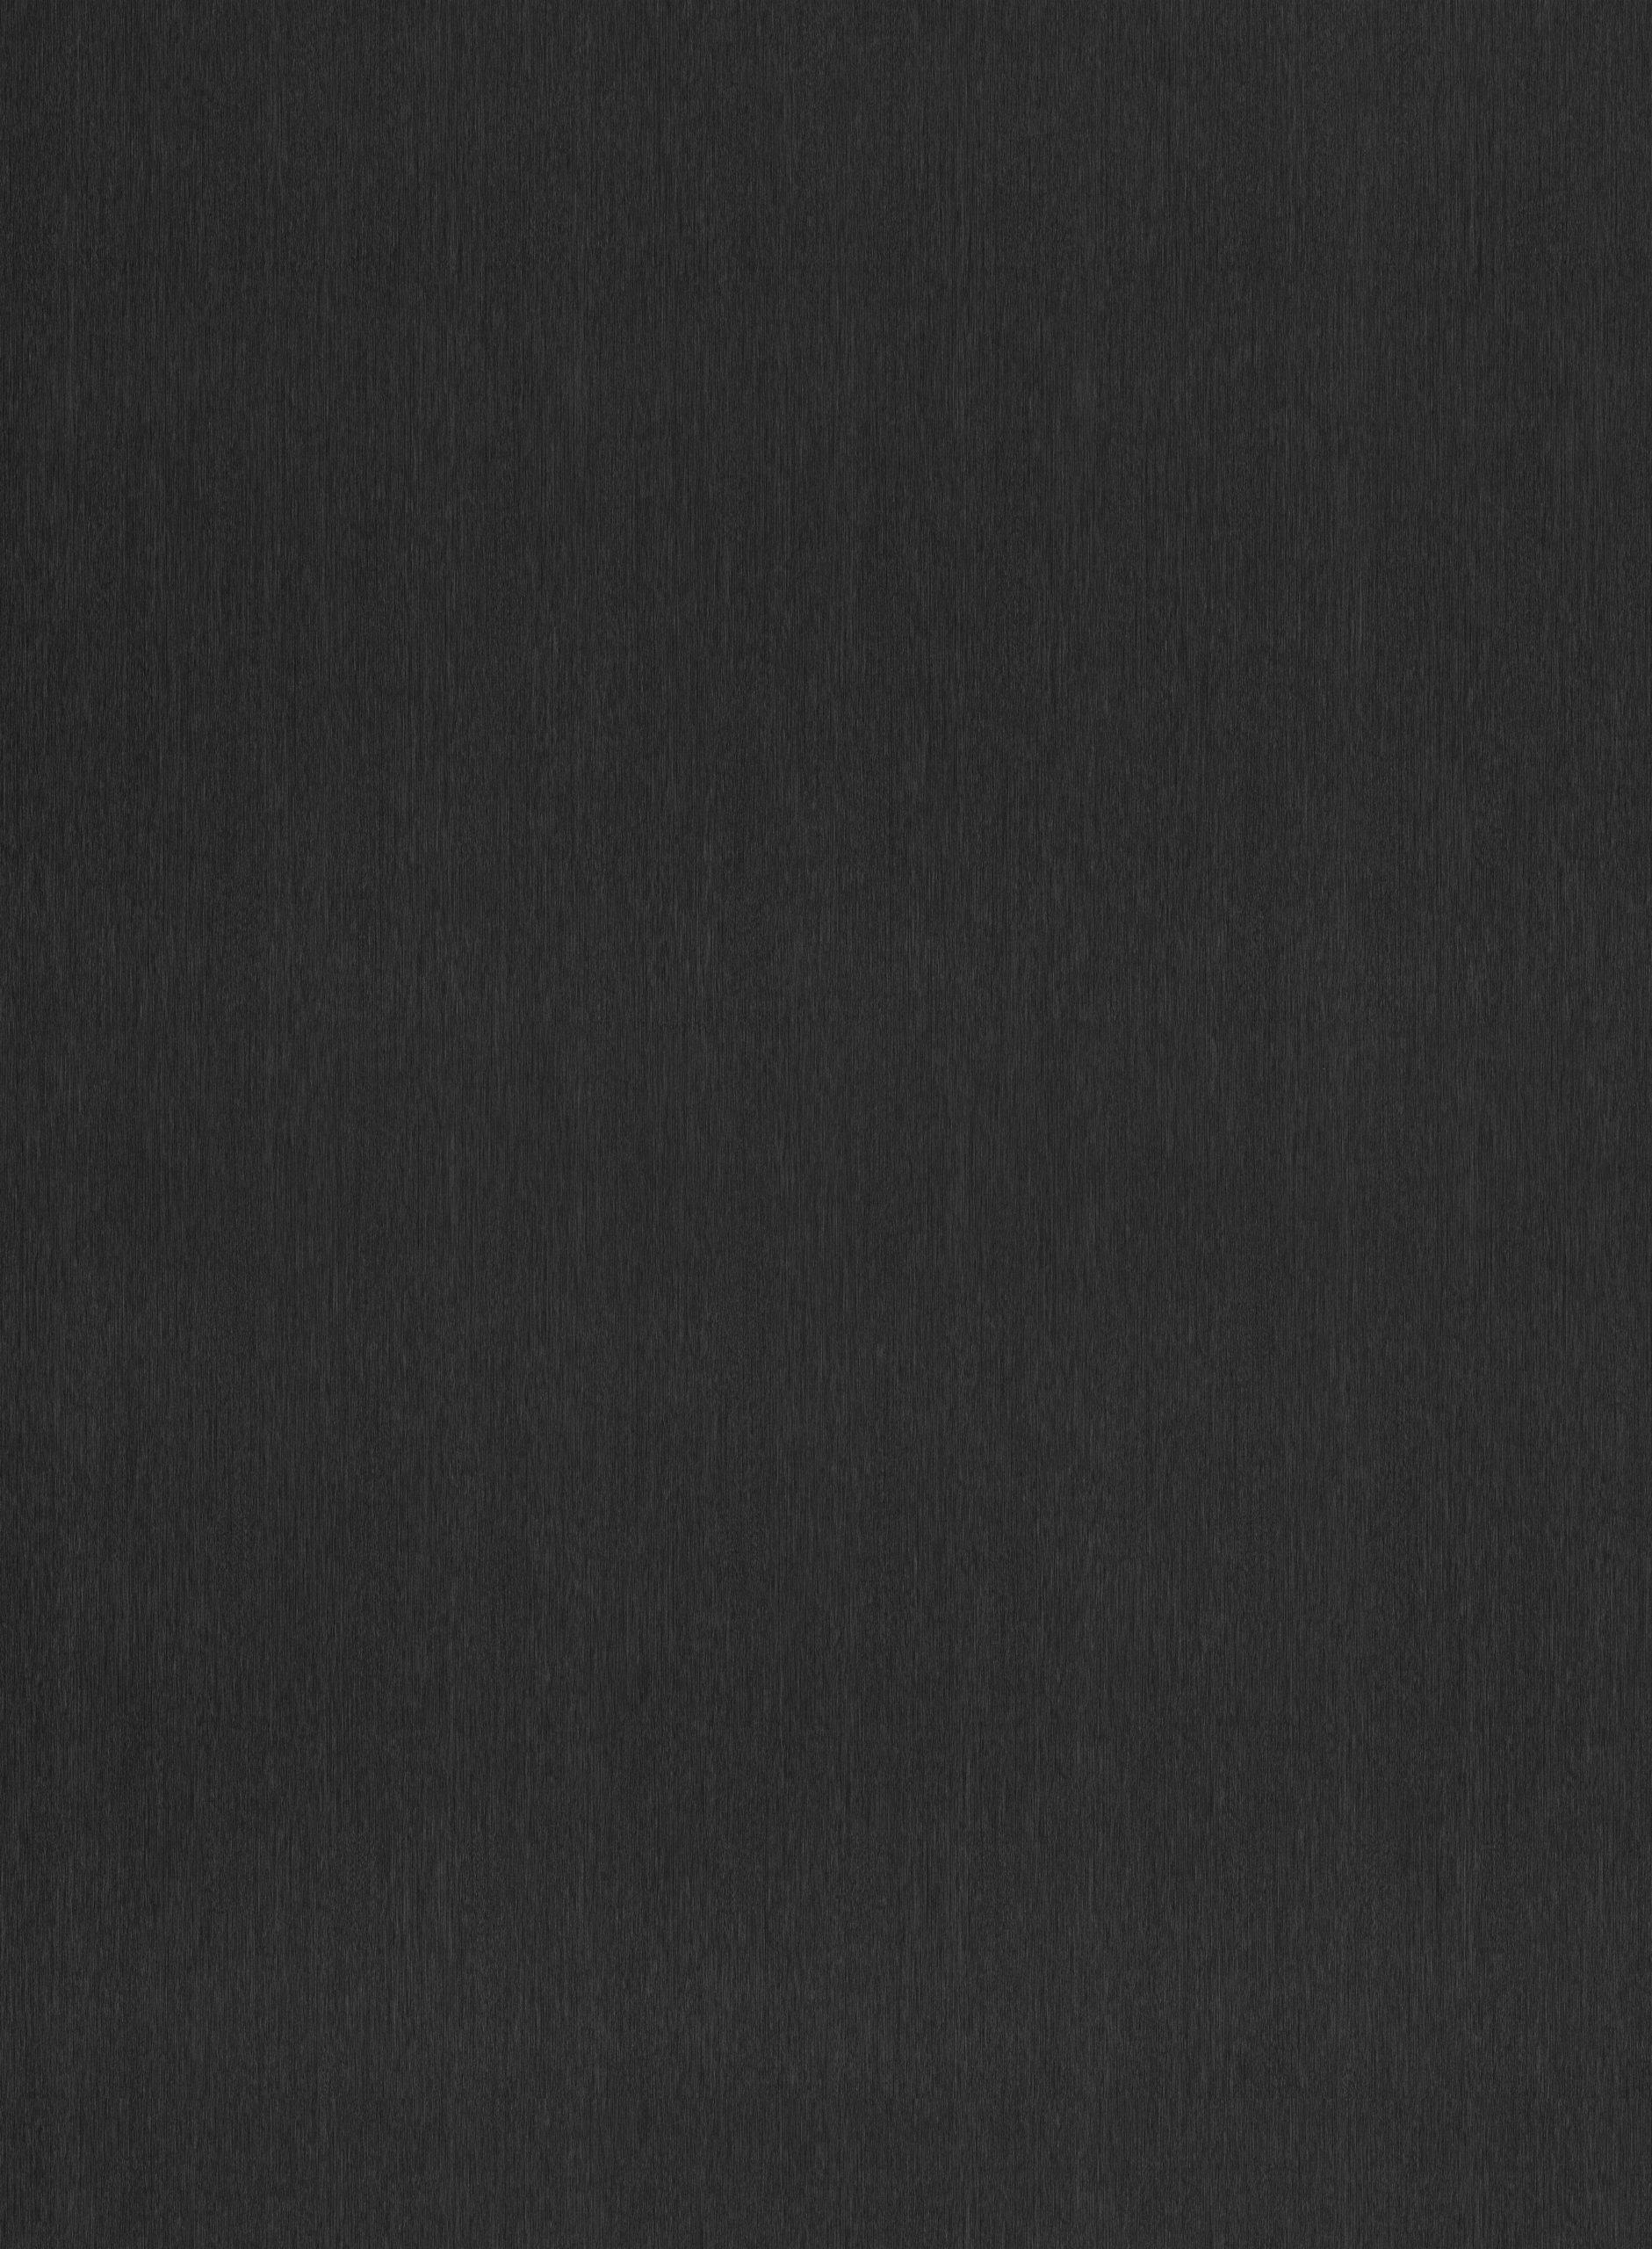 DecoLegno U129 Reflex hele plaatafb. 2800x2070 mm / tekenprogramma